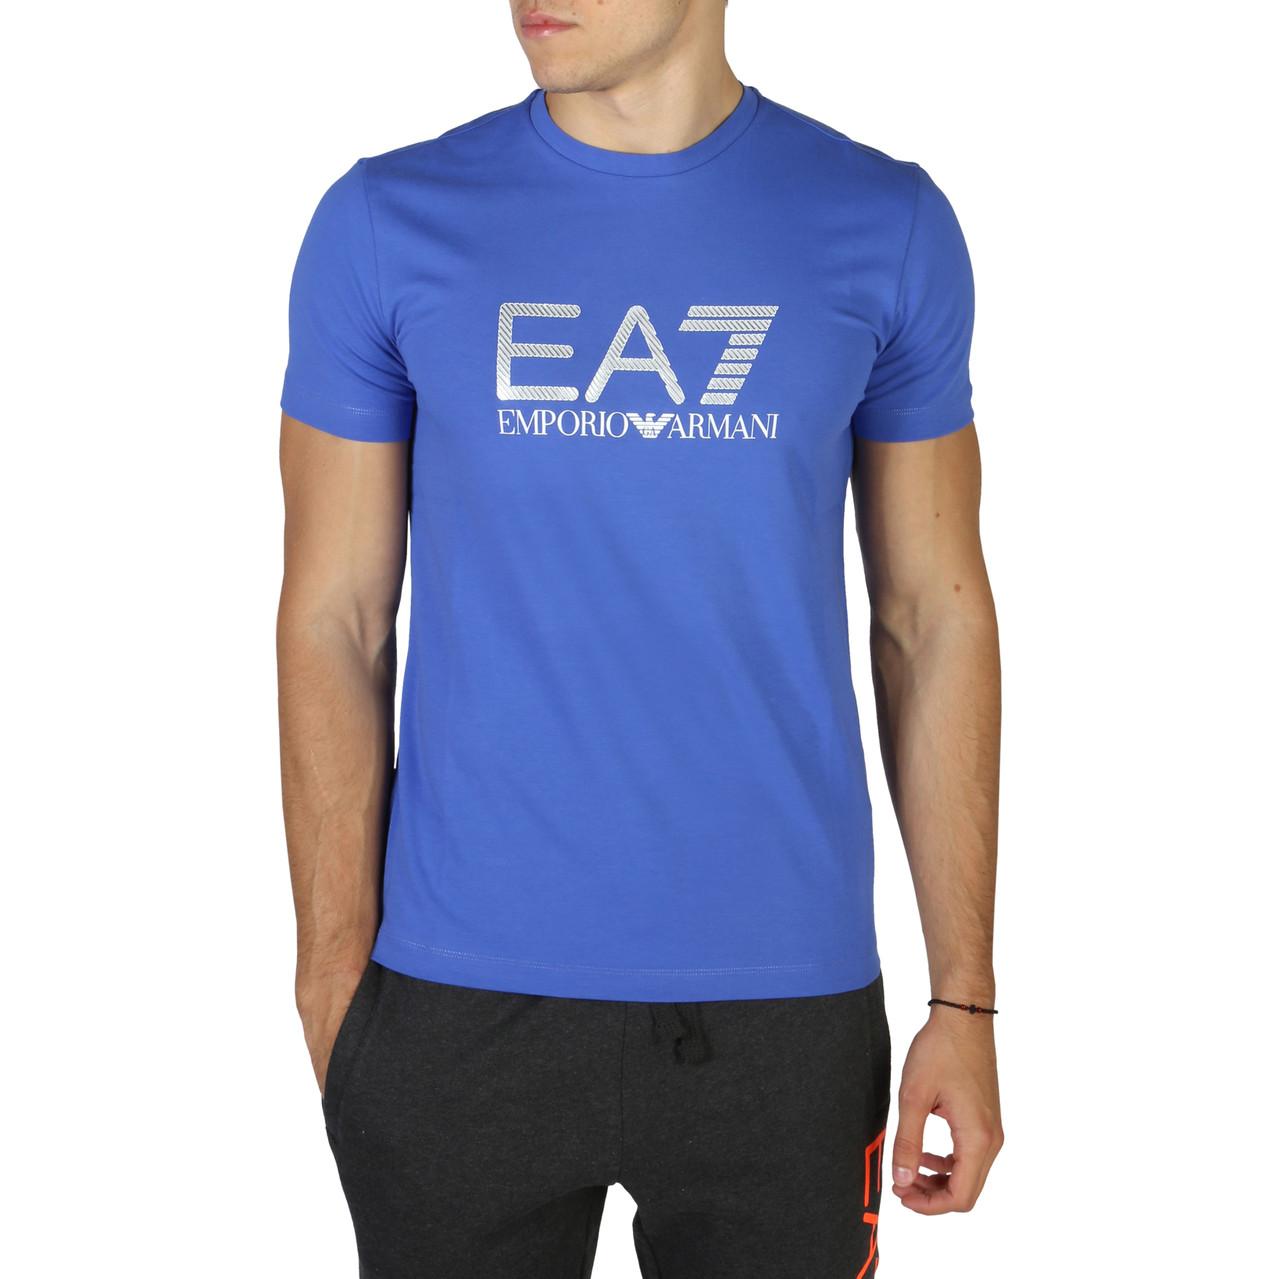 Футболка Emporio Armani EA7. Розмір M (ORIGINAL)